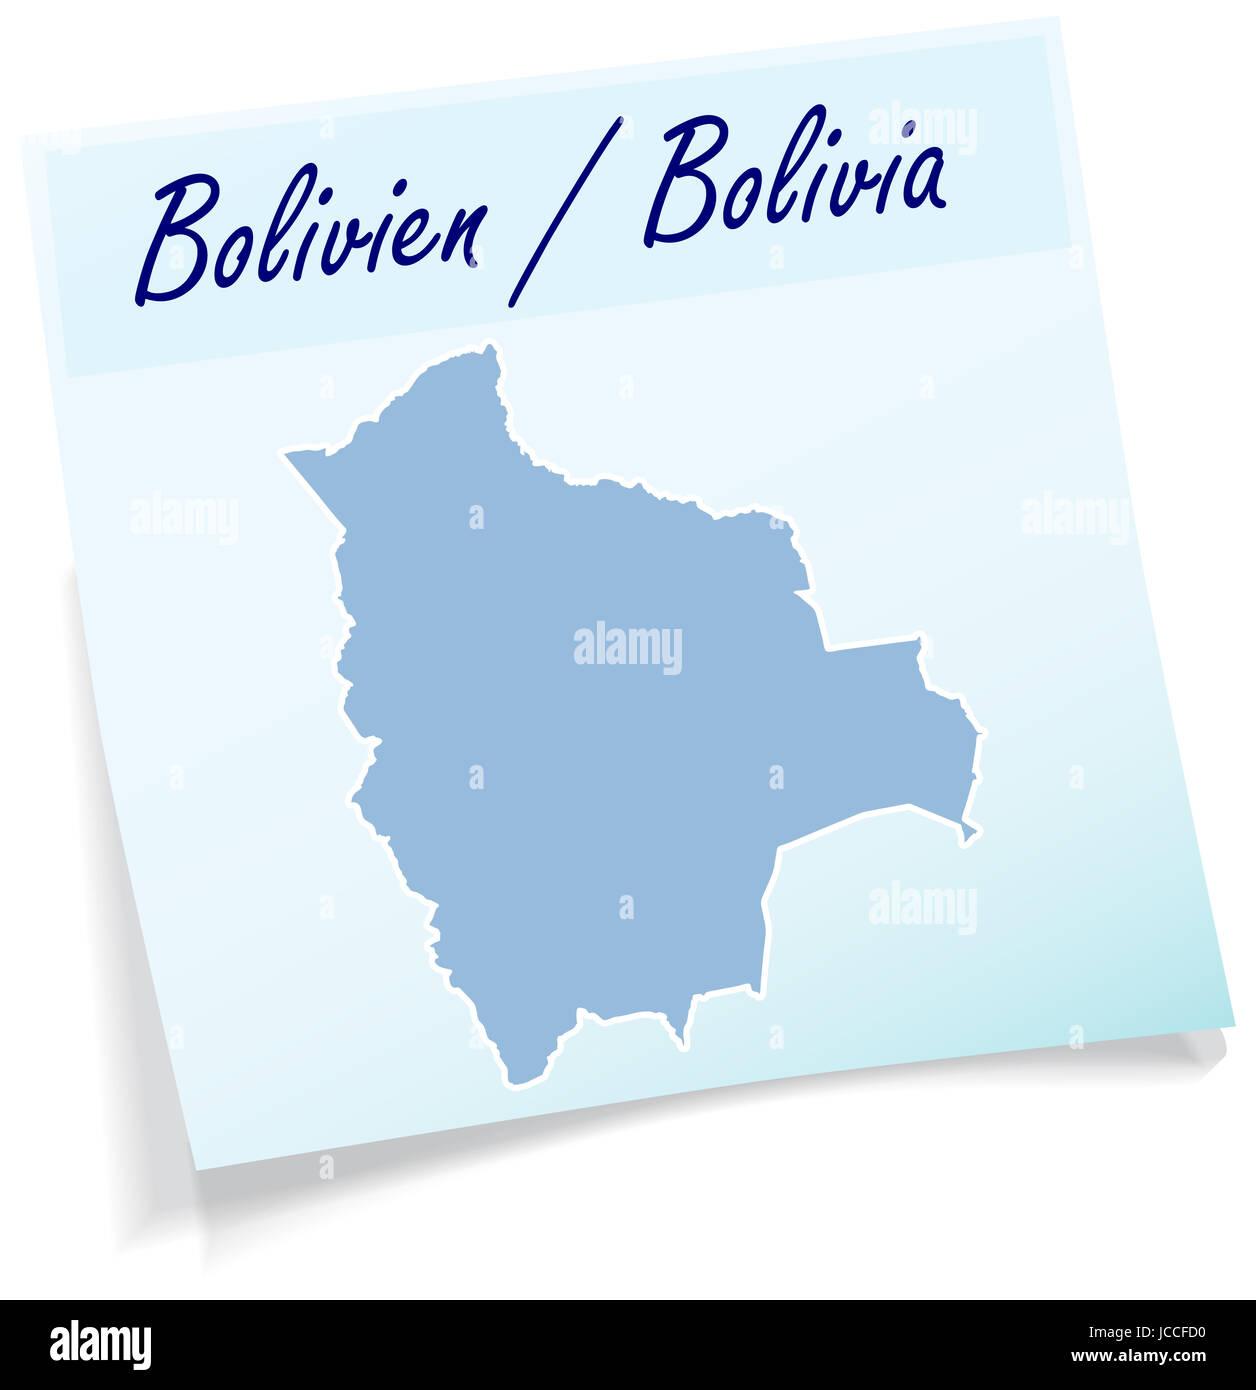 Bolivien als Notizzettel in Blau - Stock Image